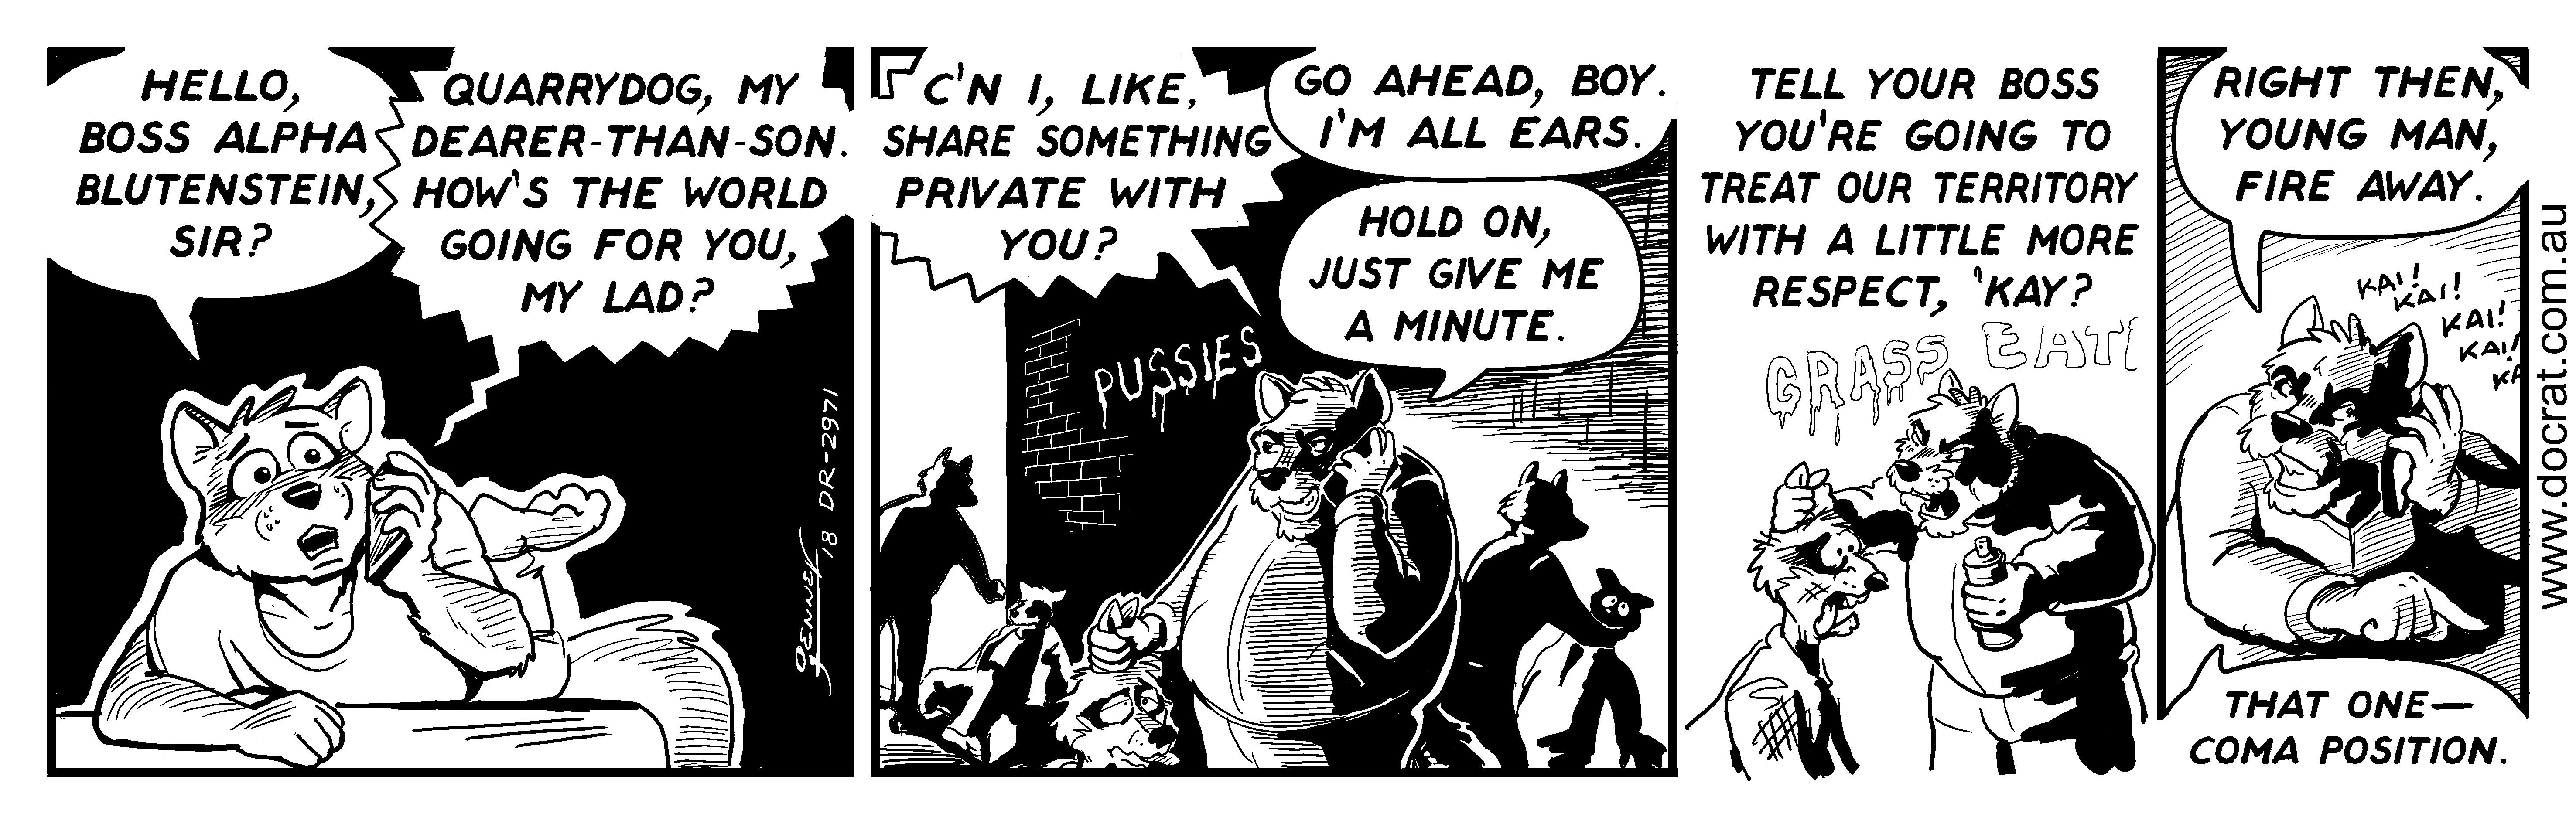 20180212